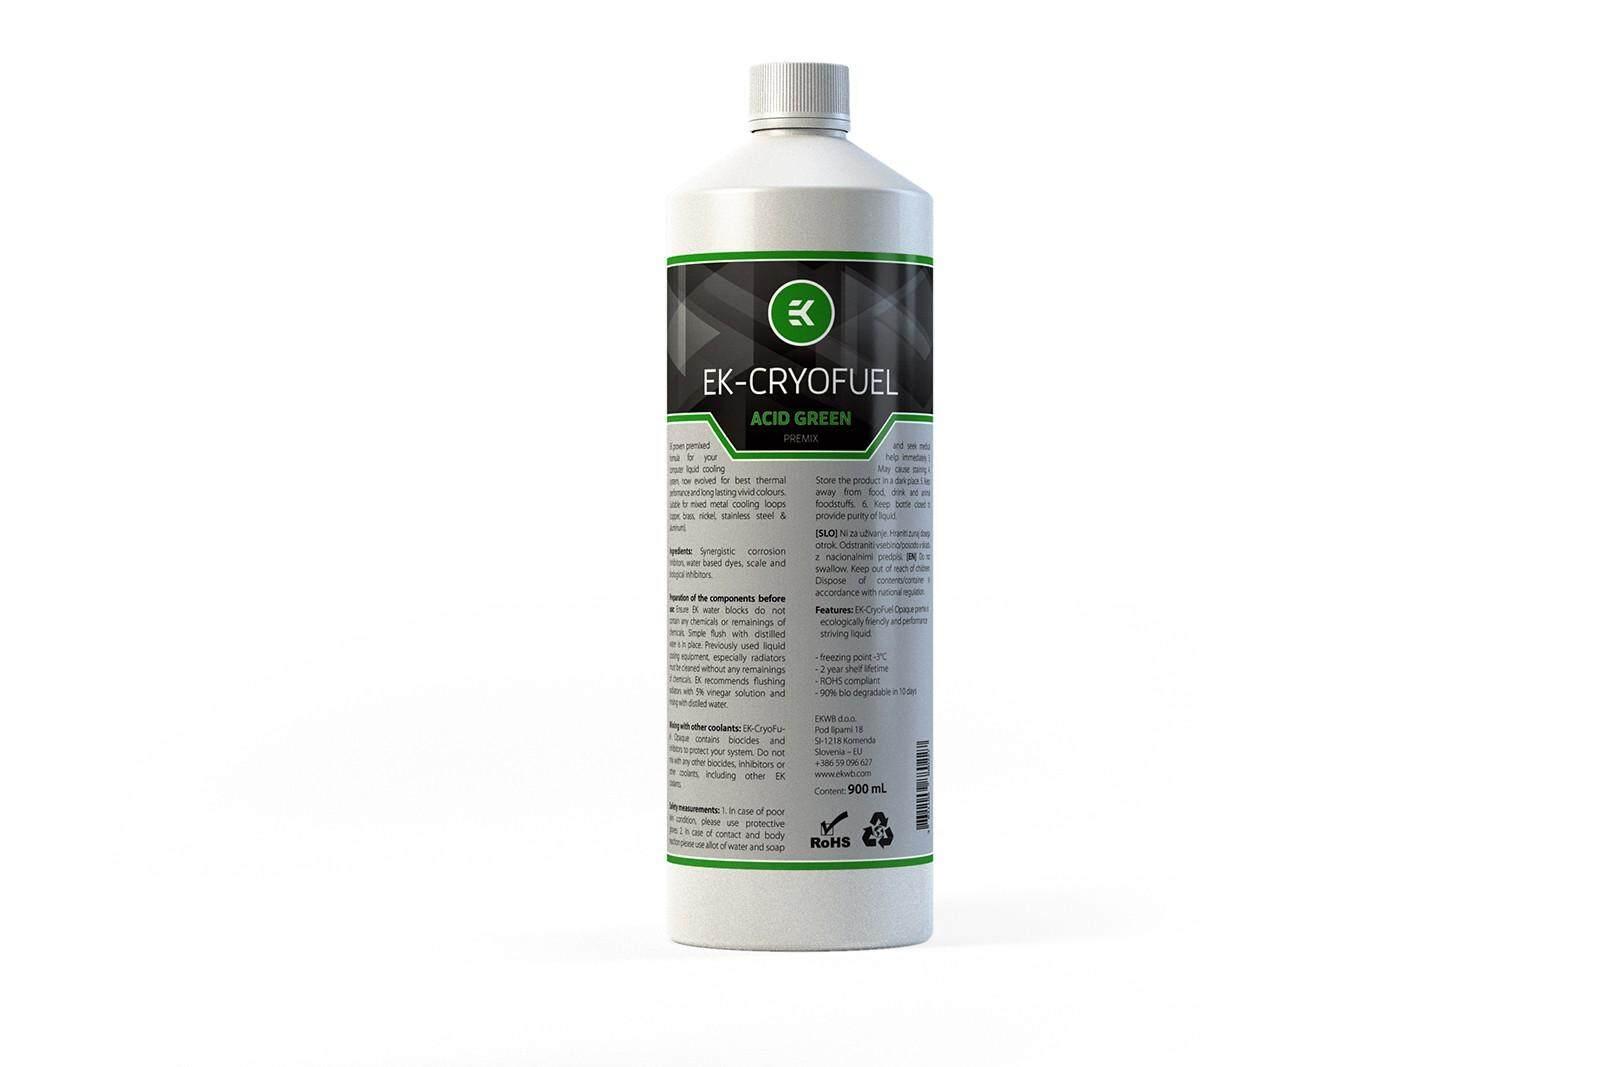 # EKWB EK-CryoFuel Premix 900 mL # Acid Green